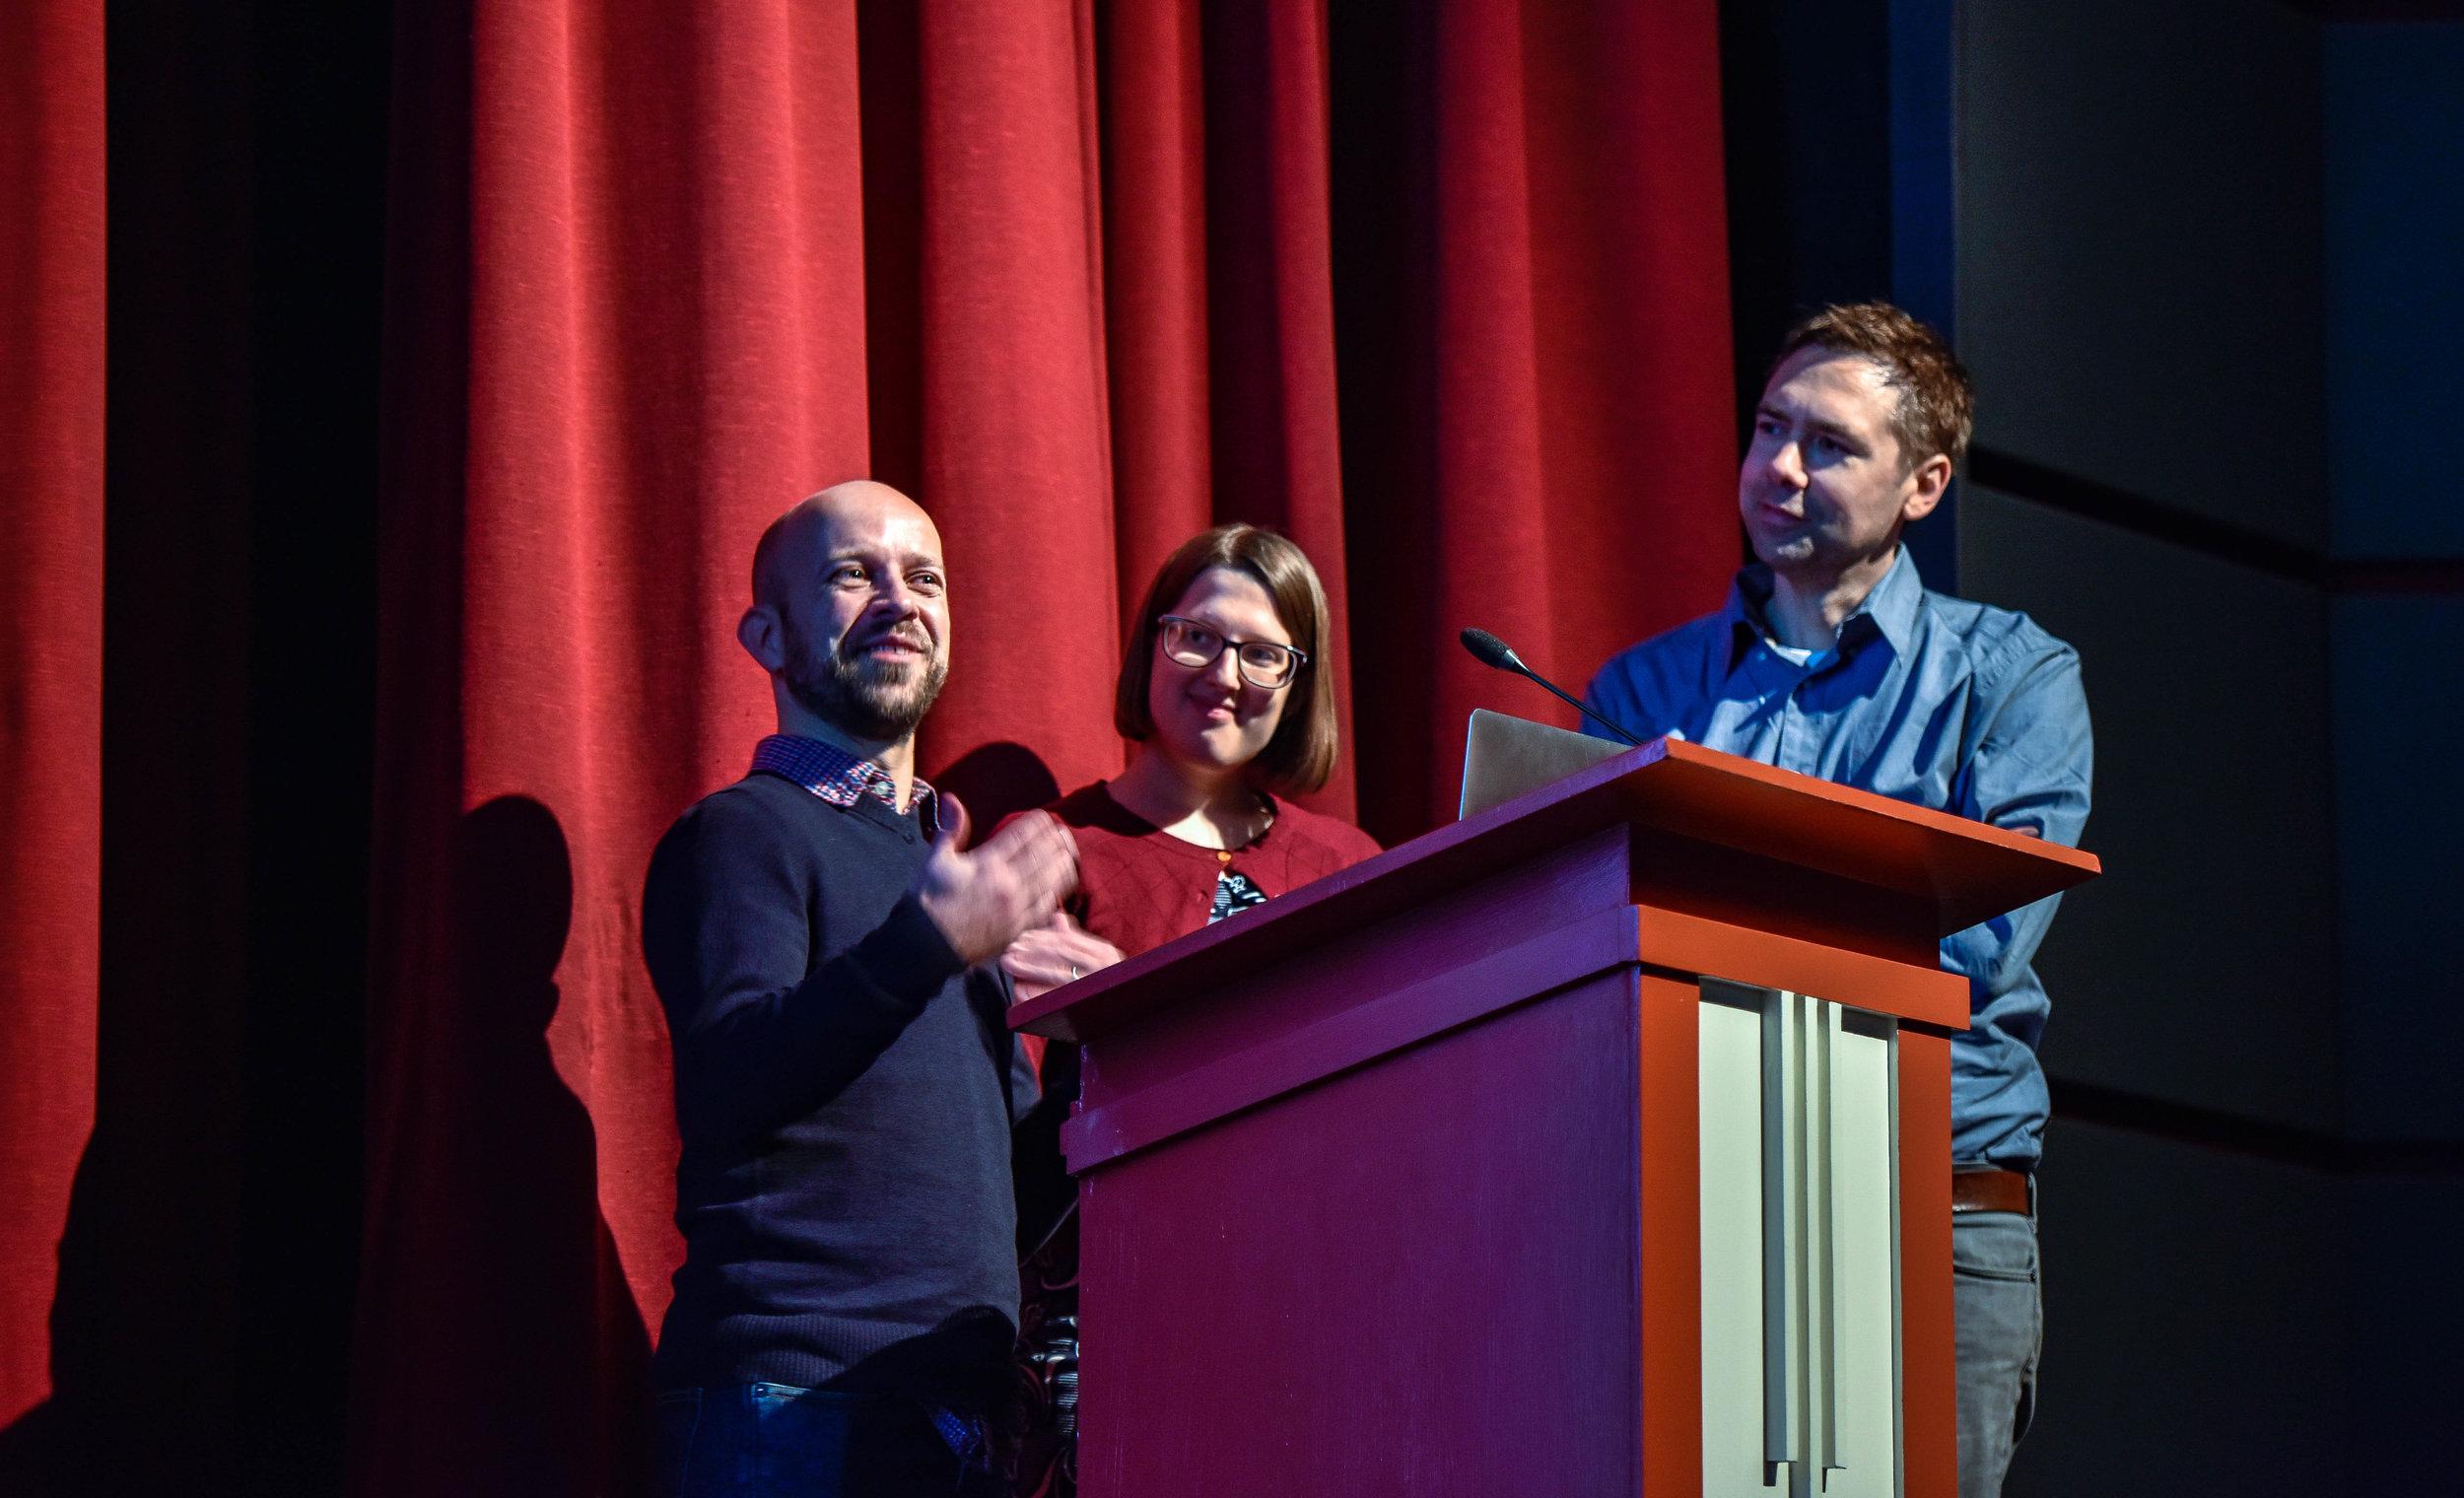 Richard England, Jordan Erica Webber, and Keith Stuart